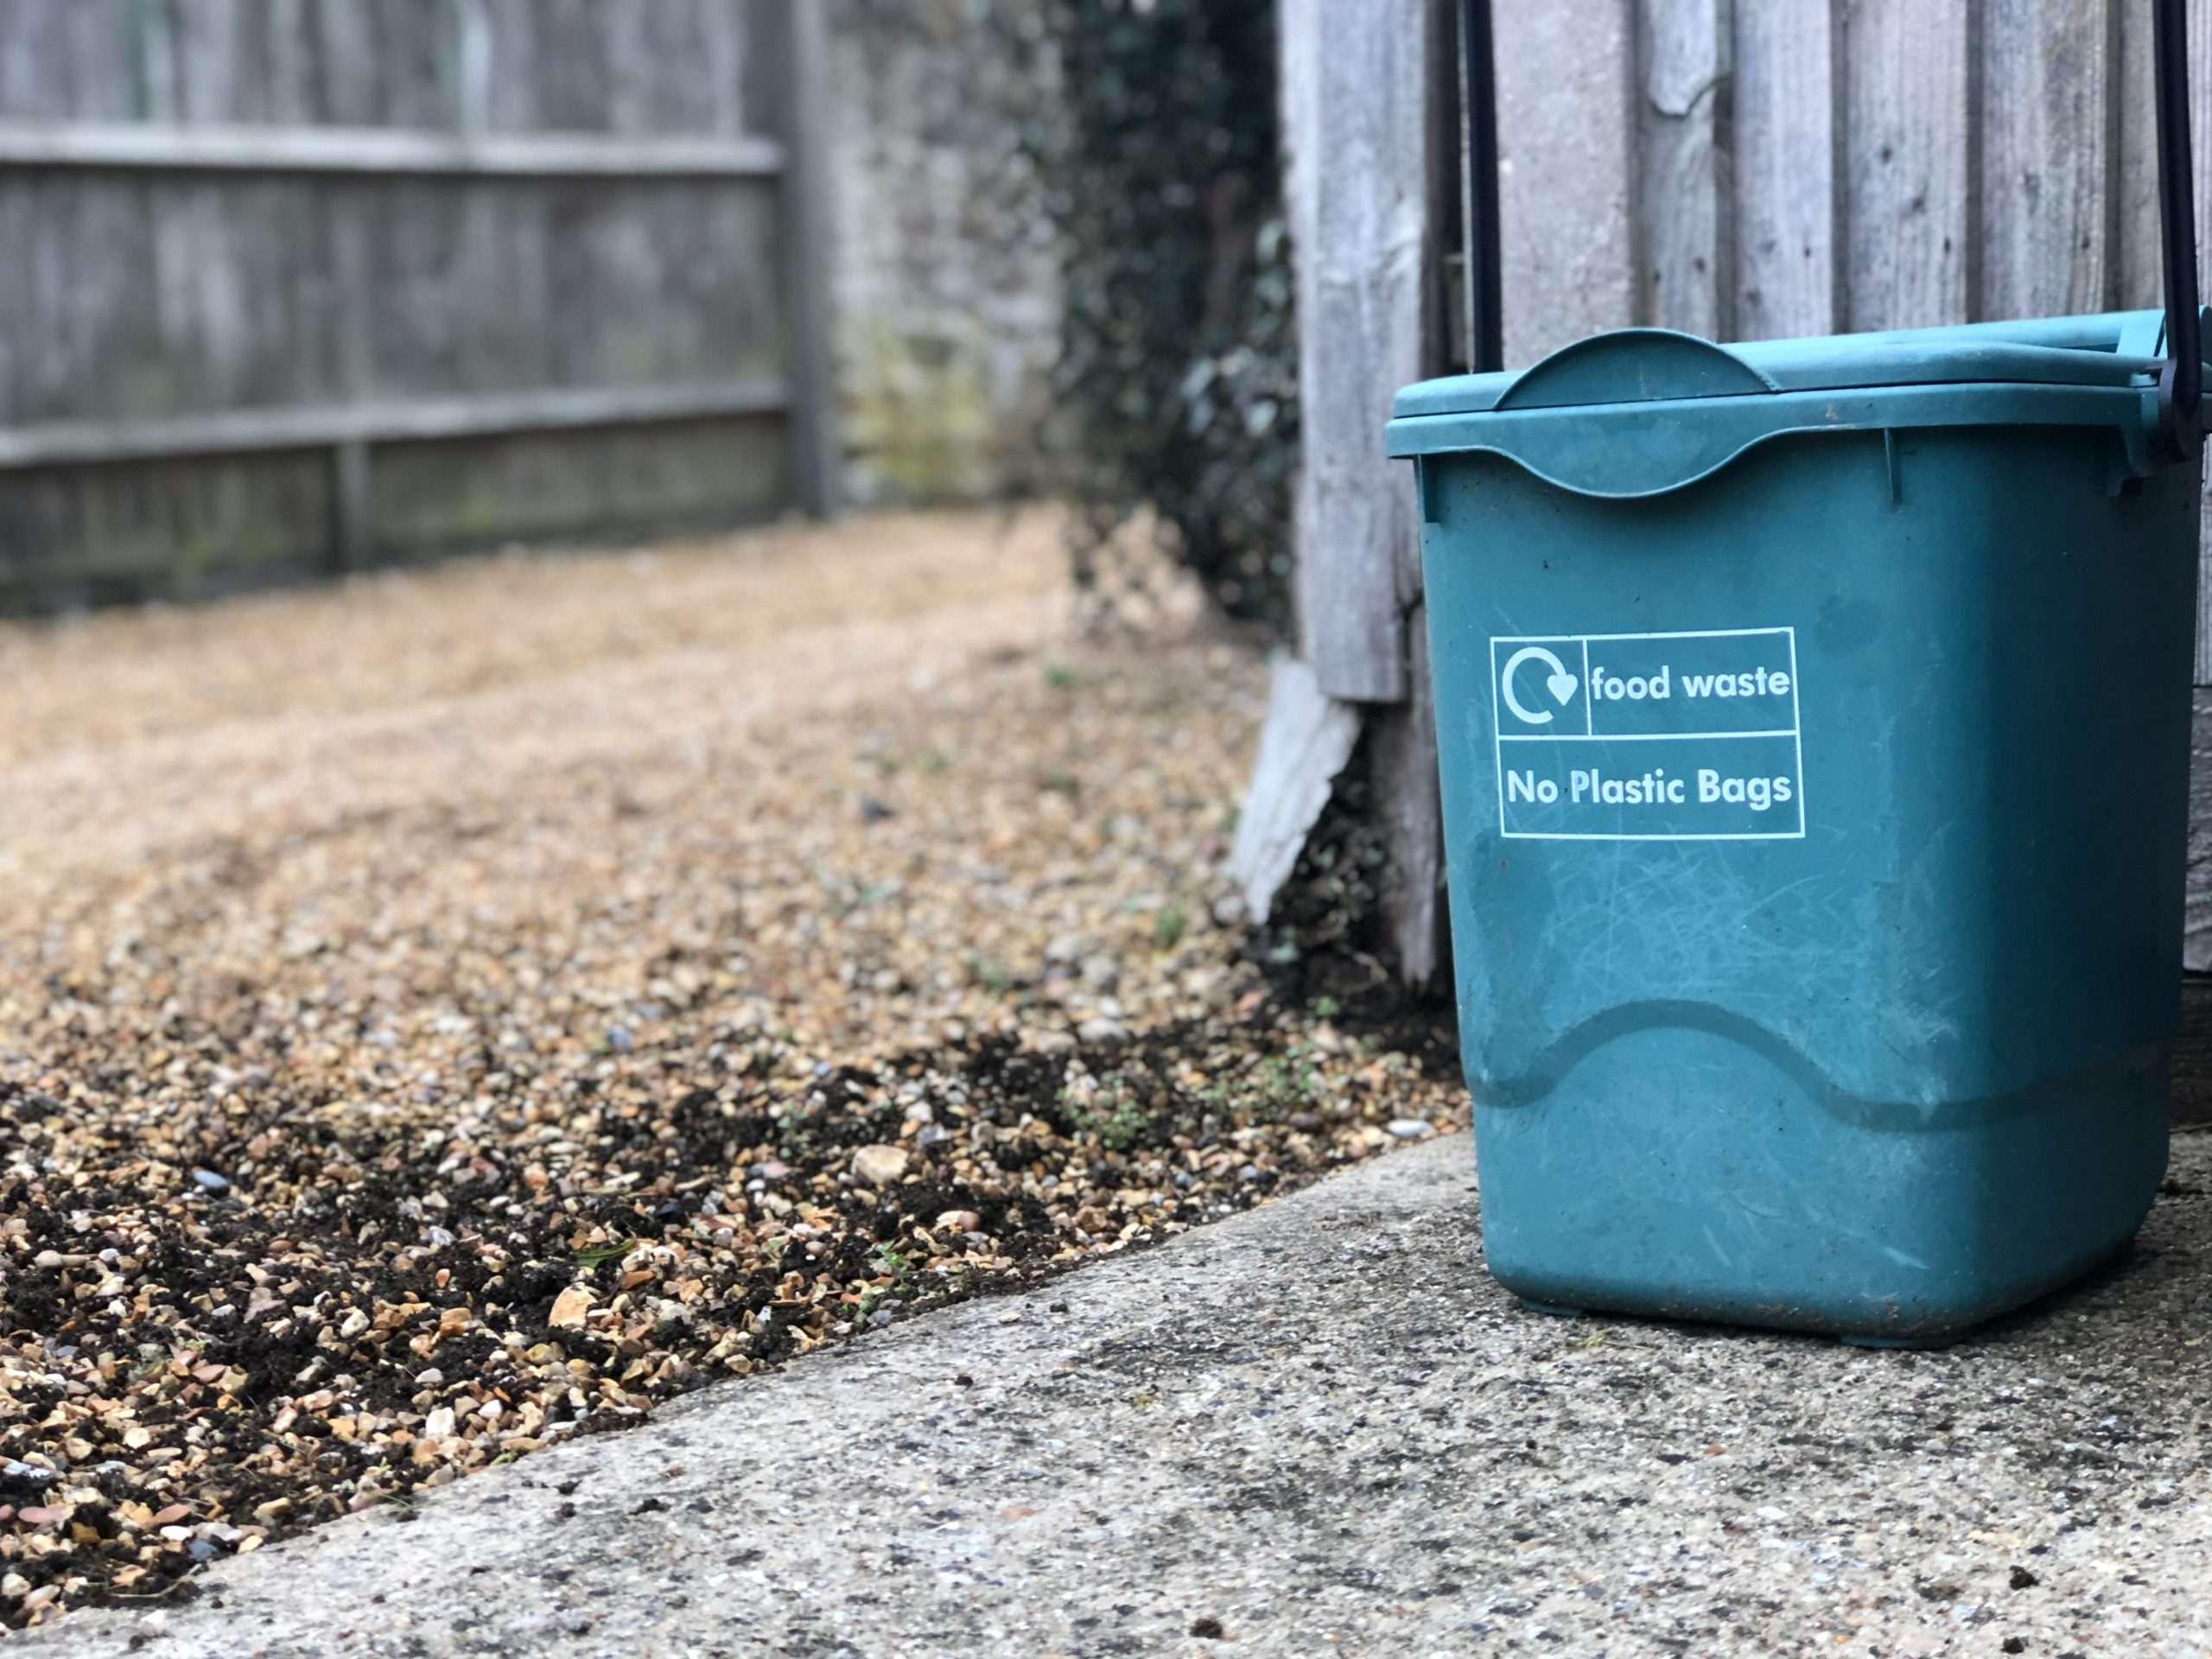 trash bin for food waste- no plastic bags